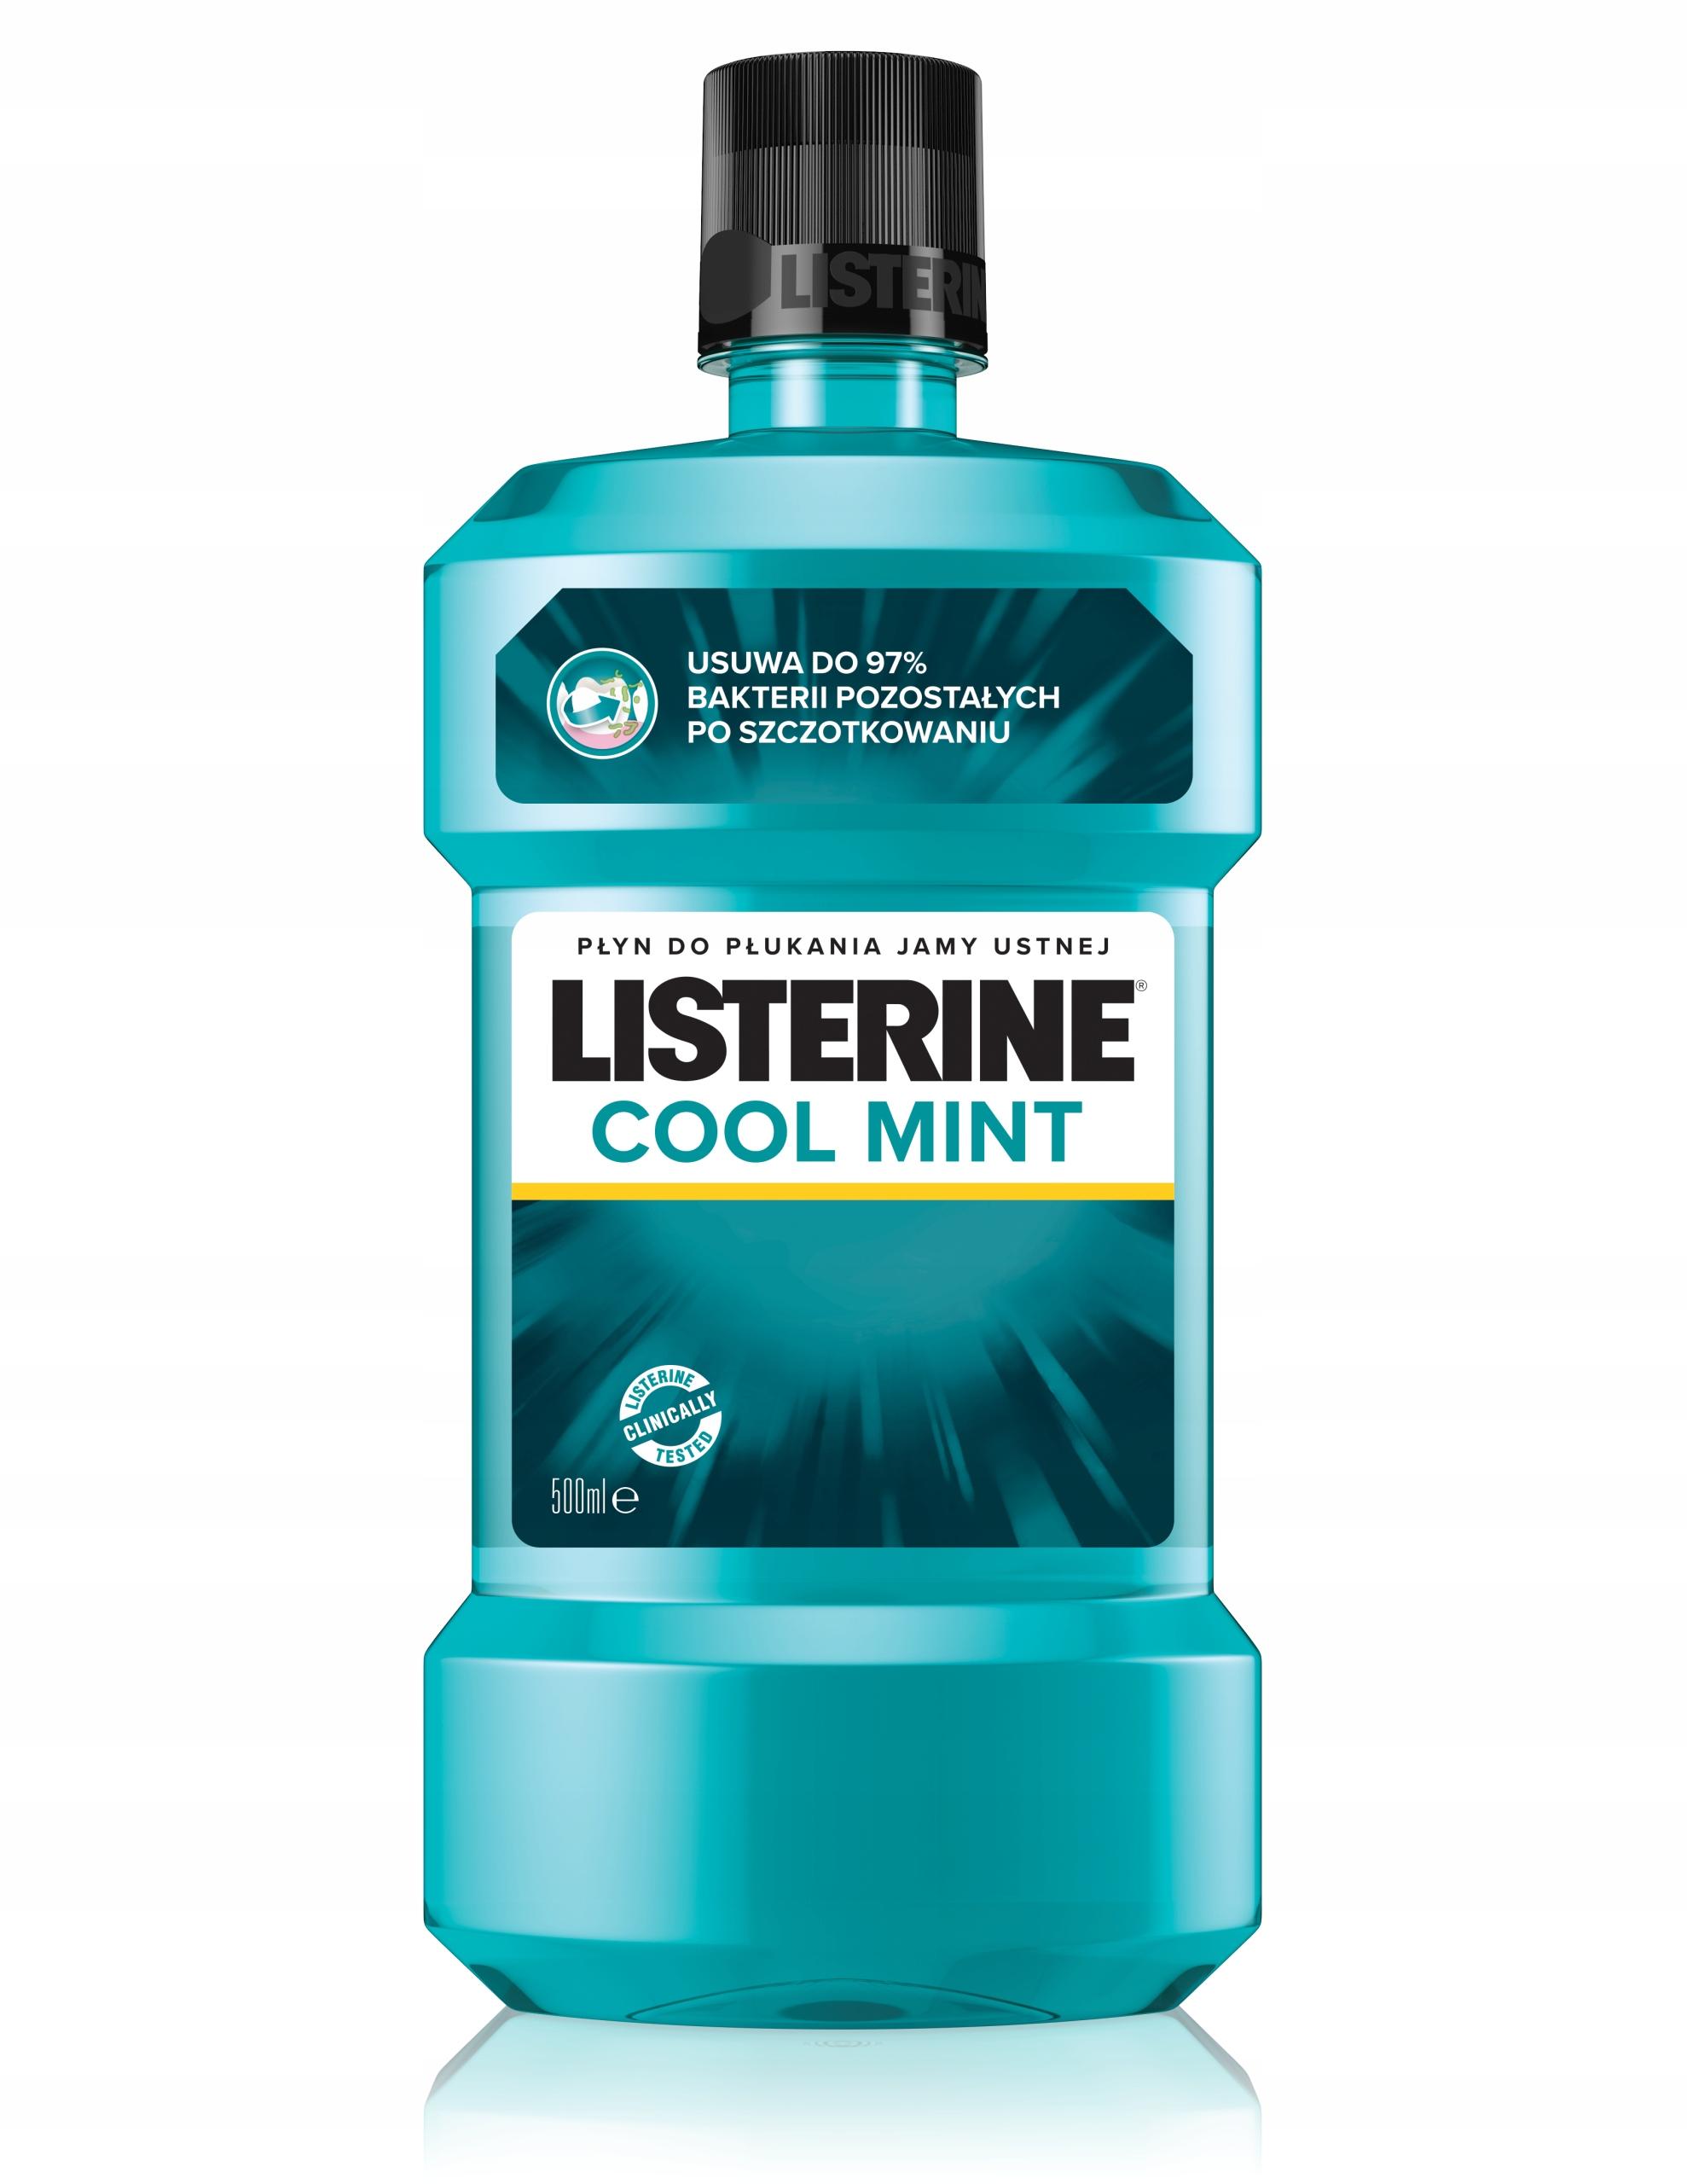 LISTERINE COOL MINT Płyn do płukania ust 500 ml